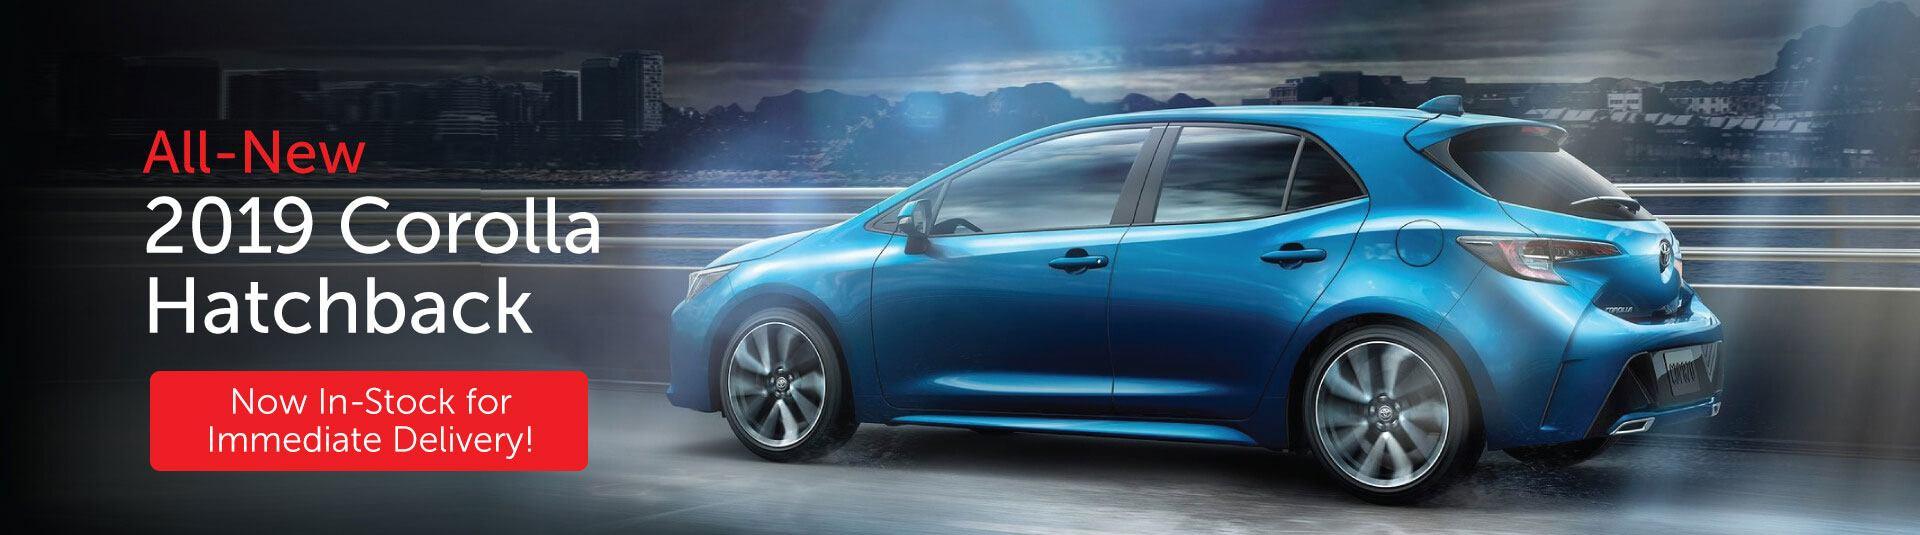 All-New 2019 Toyota Corolla Hatchback